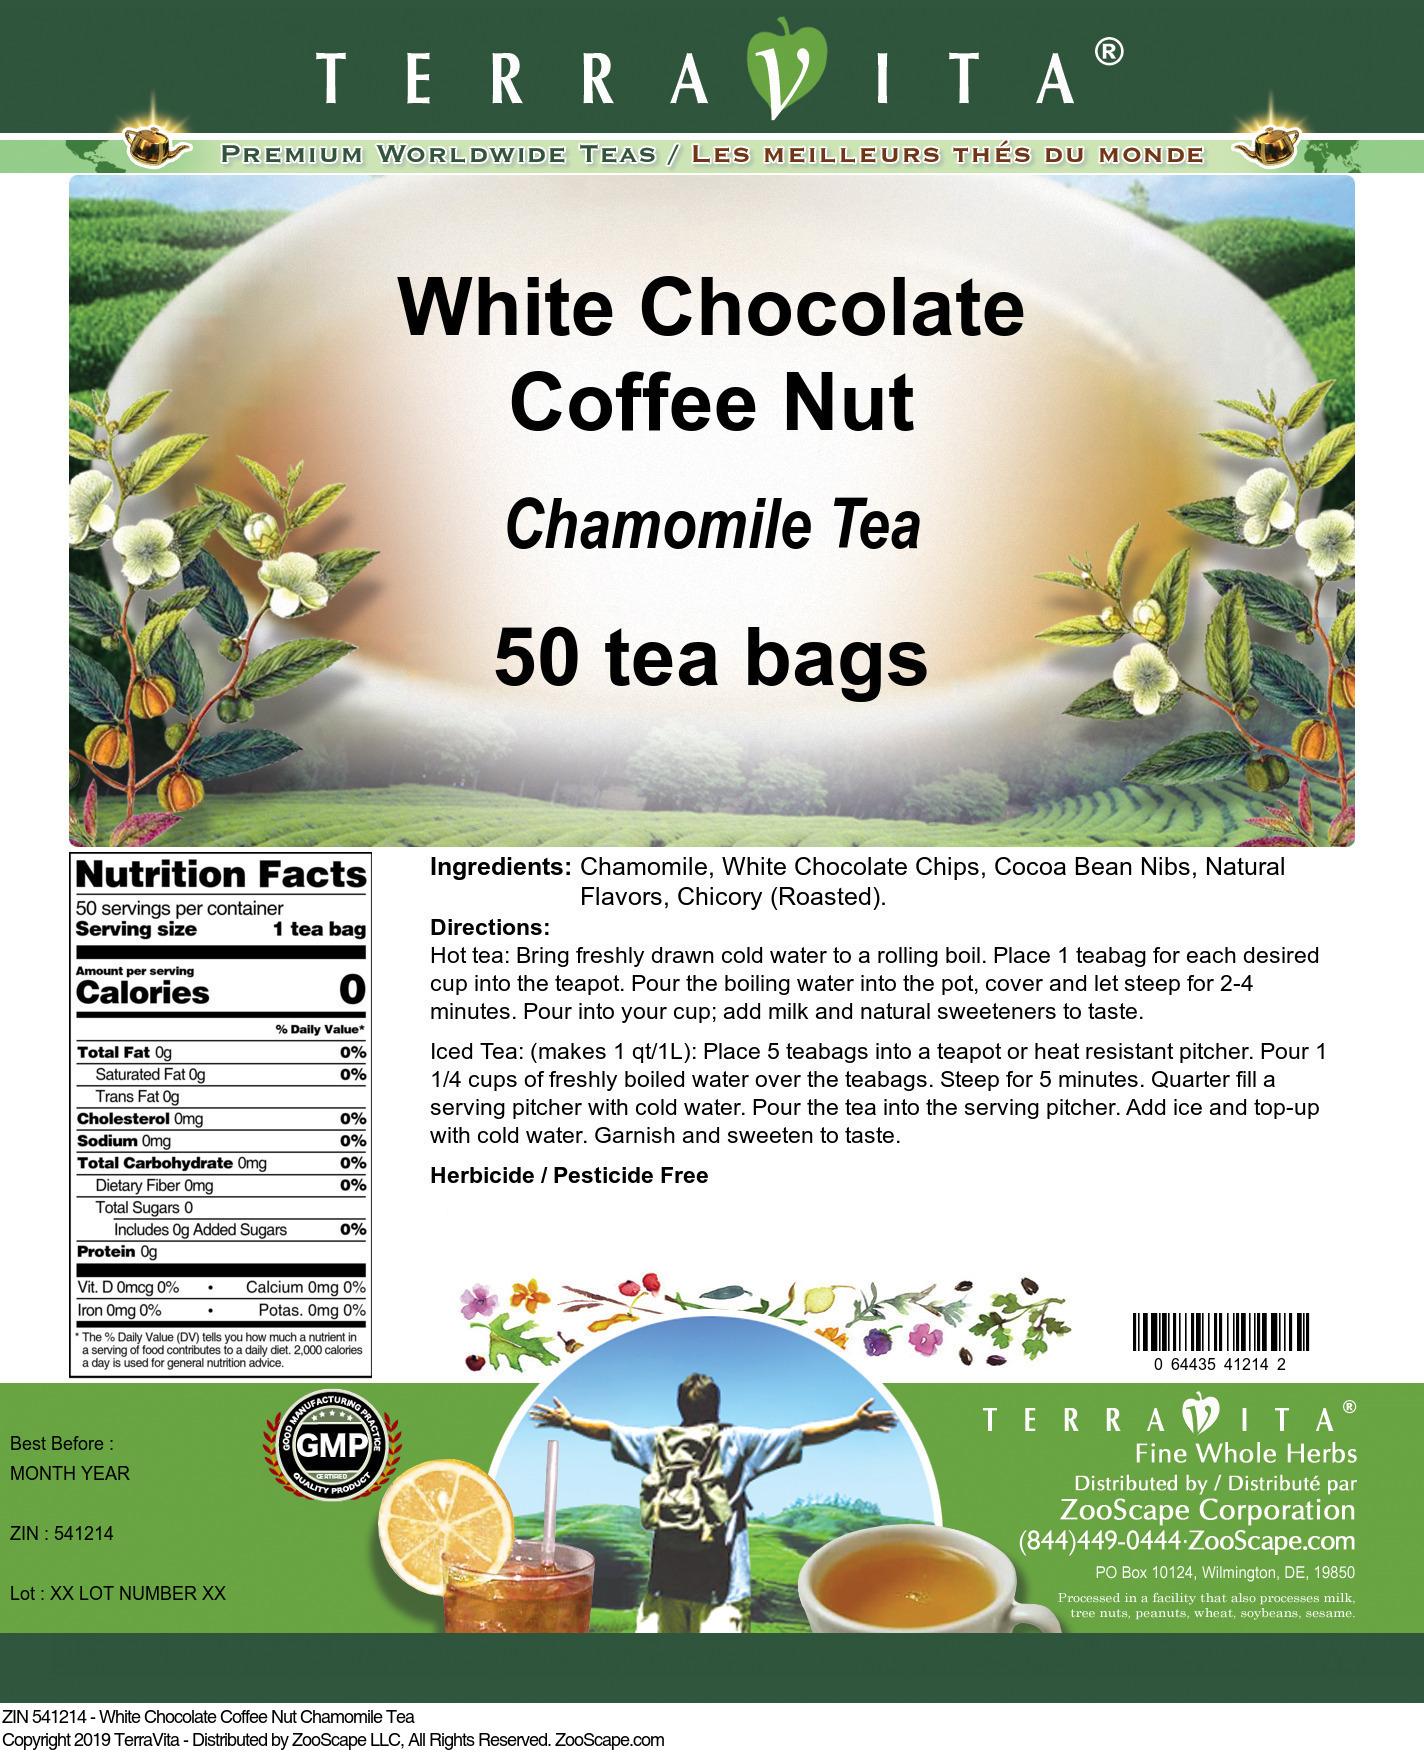 White Chocolate Coffee Nut Chamomile Tea